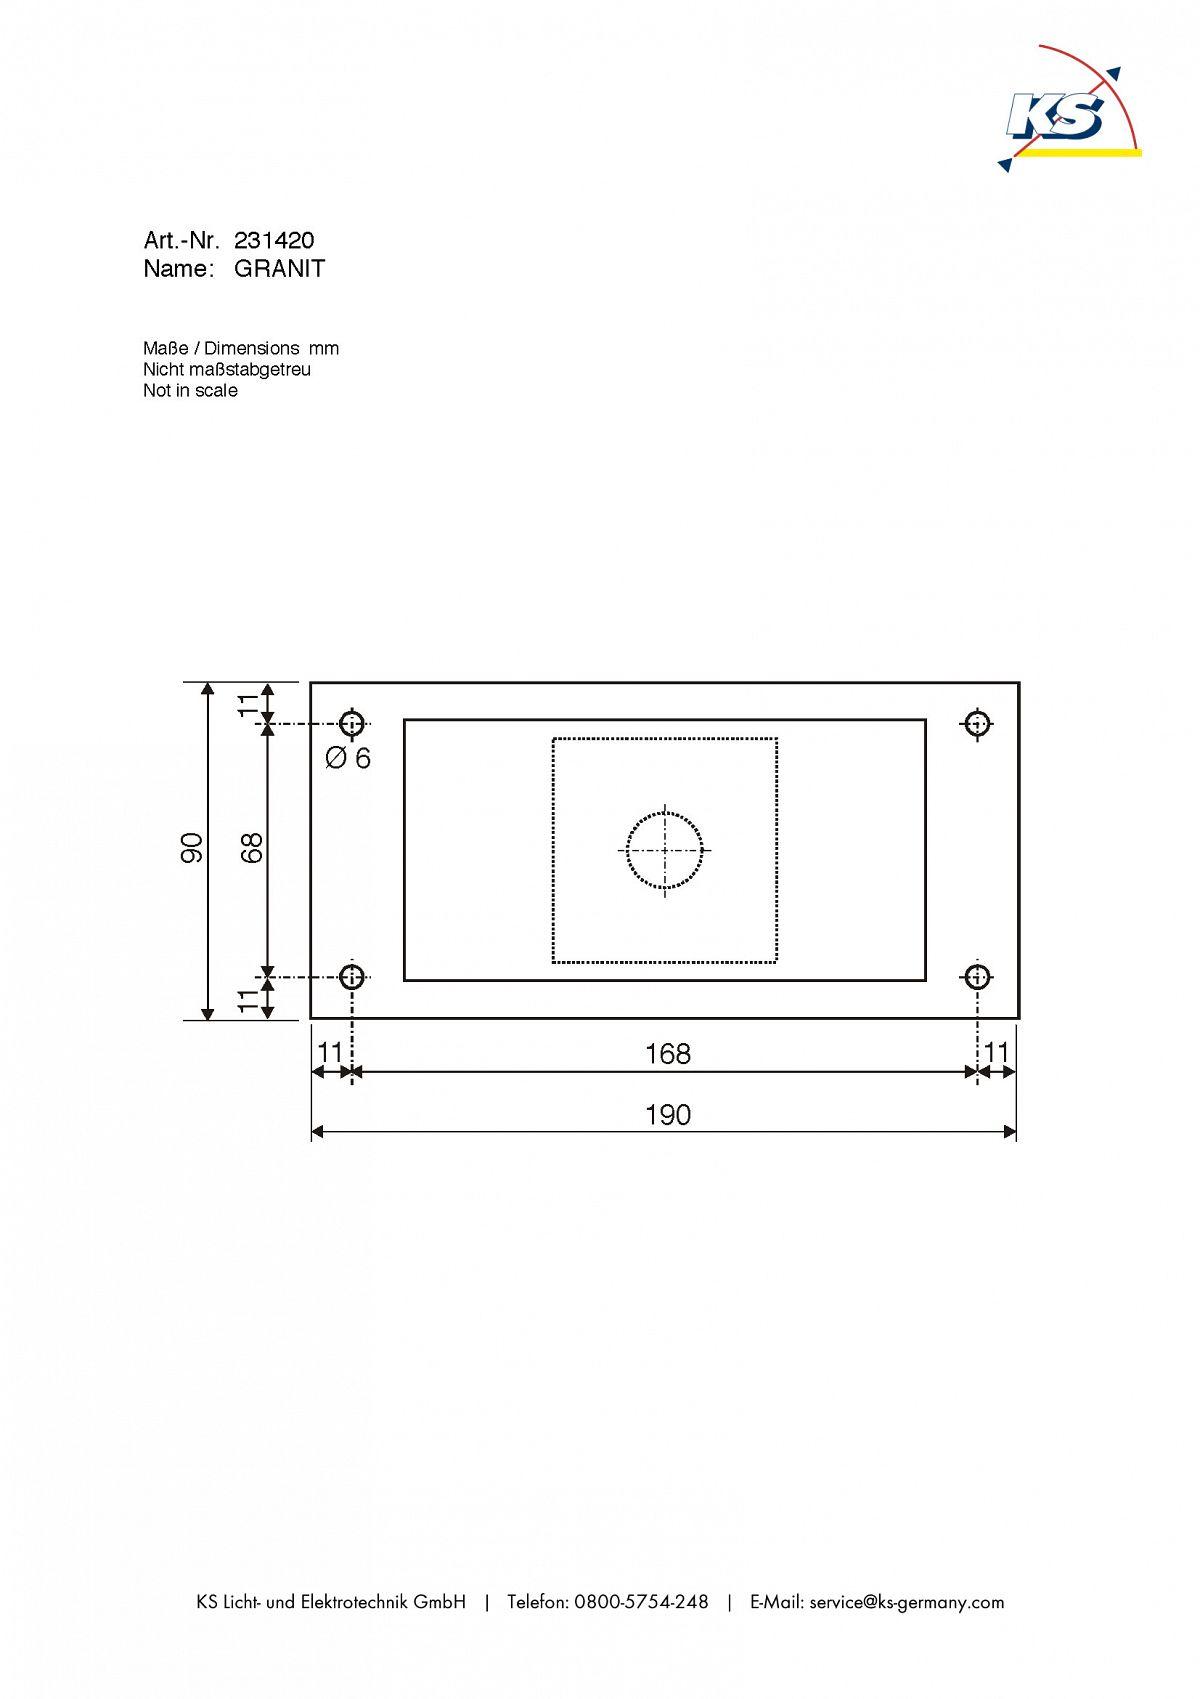 stehleuchte arrock arc gu10 granit salt pepper gu10 max 35w ks licht onlineshop. Black Bedroom Furniture Sets. Home Design Ideas